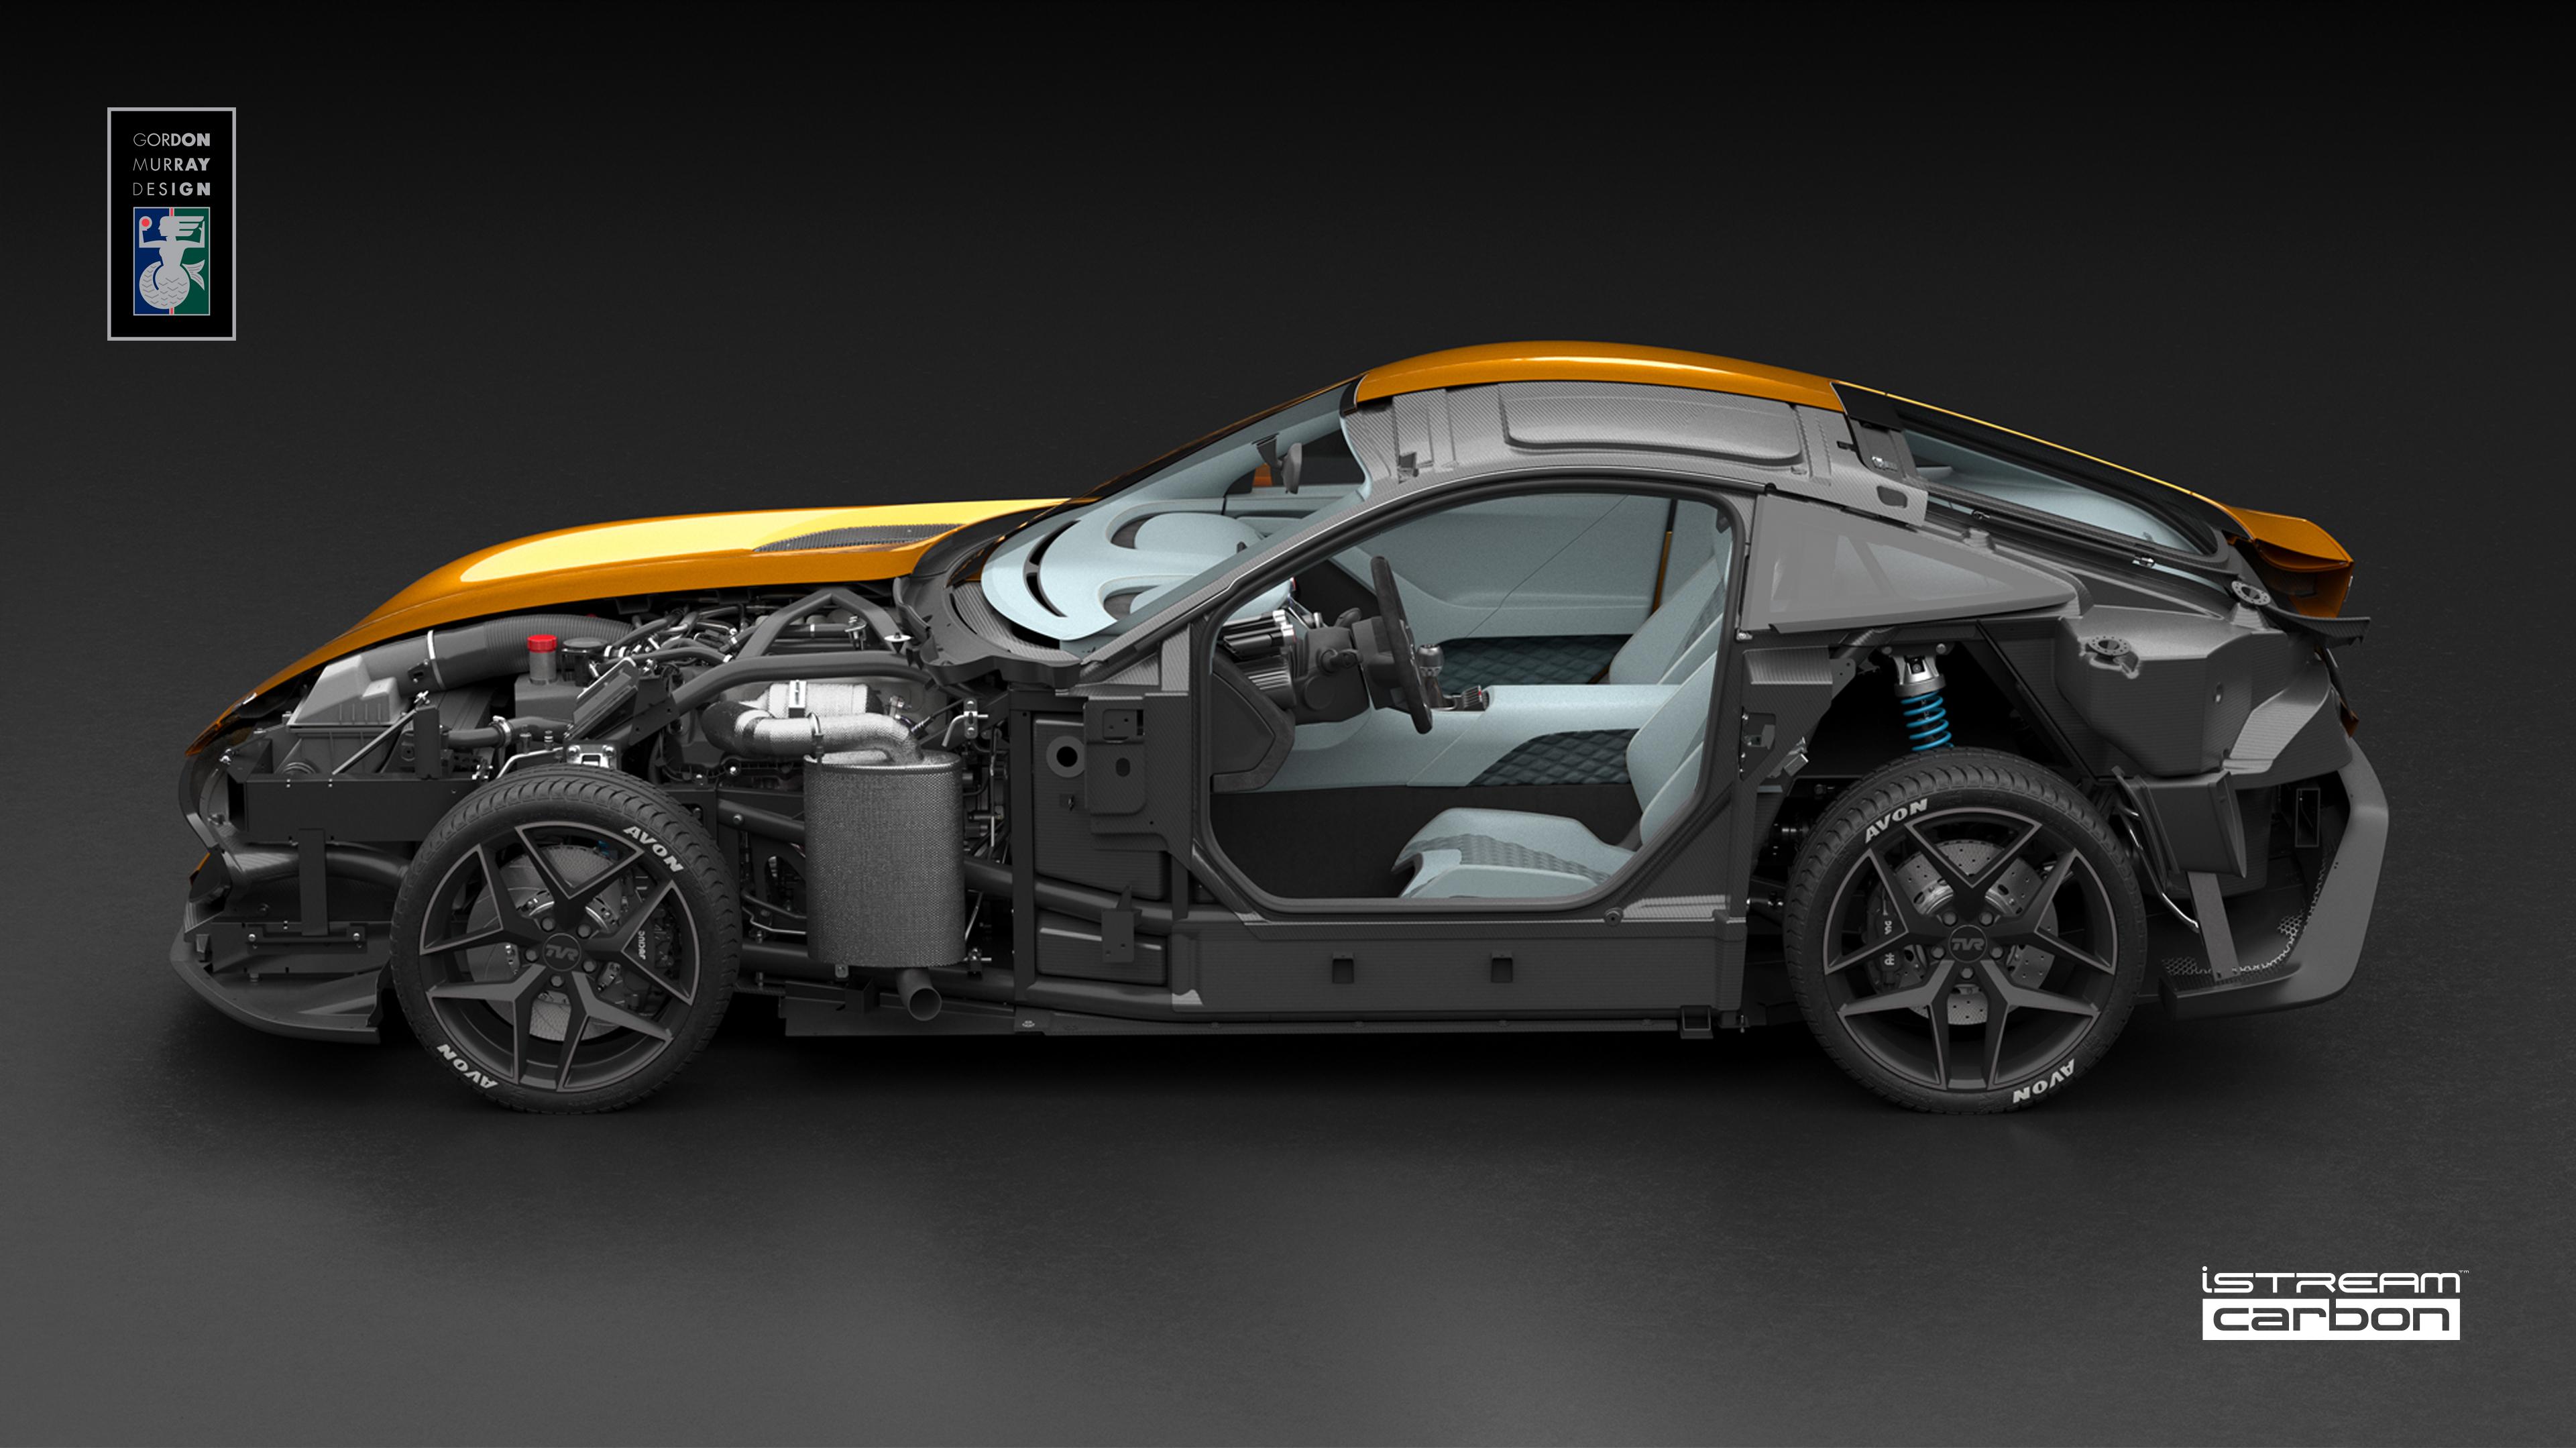 mclaren f1 designer gordon murray creates his own car. Black Bedroom Furniture Sets. Home Design Ideas